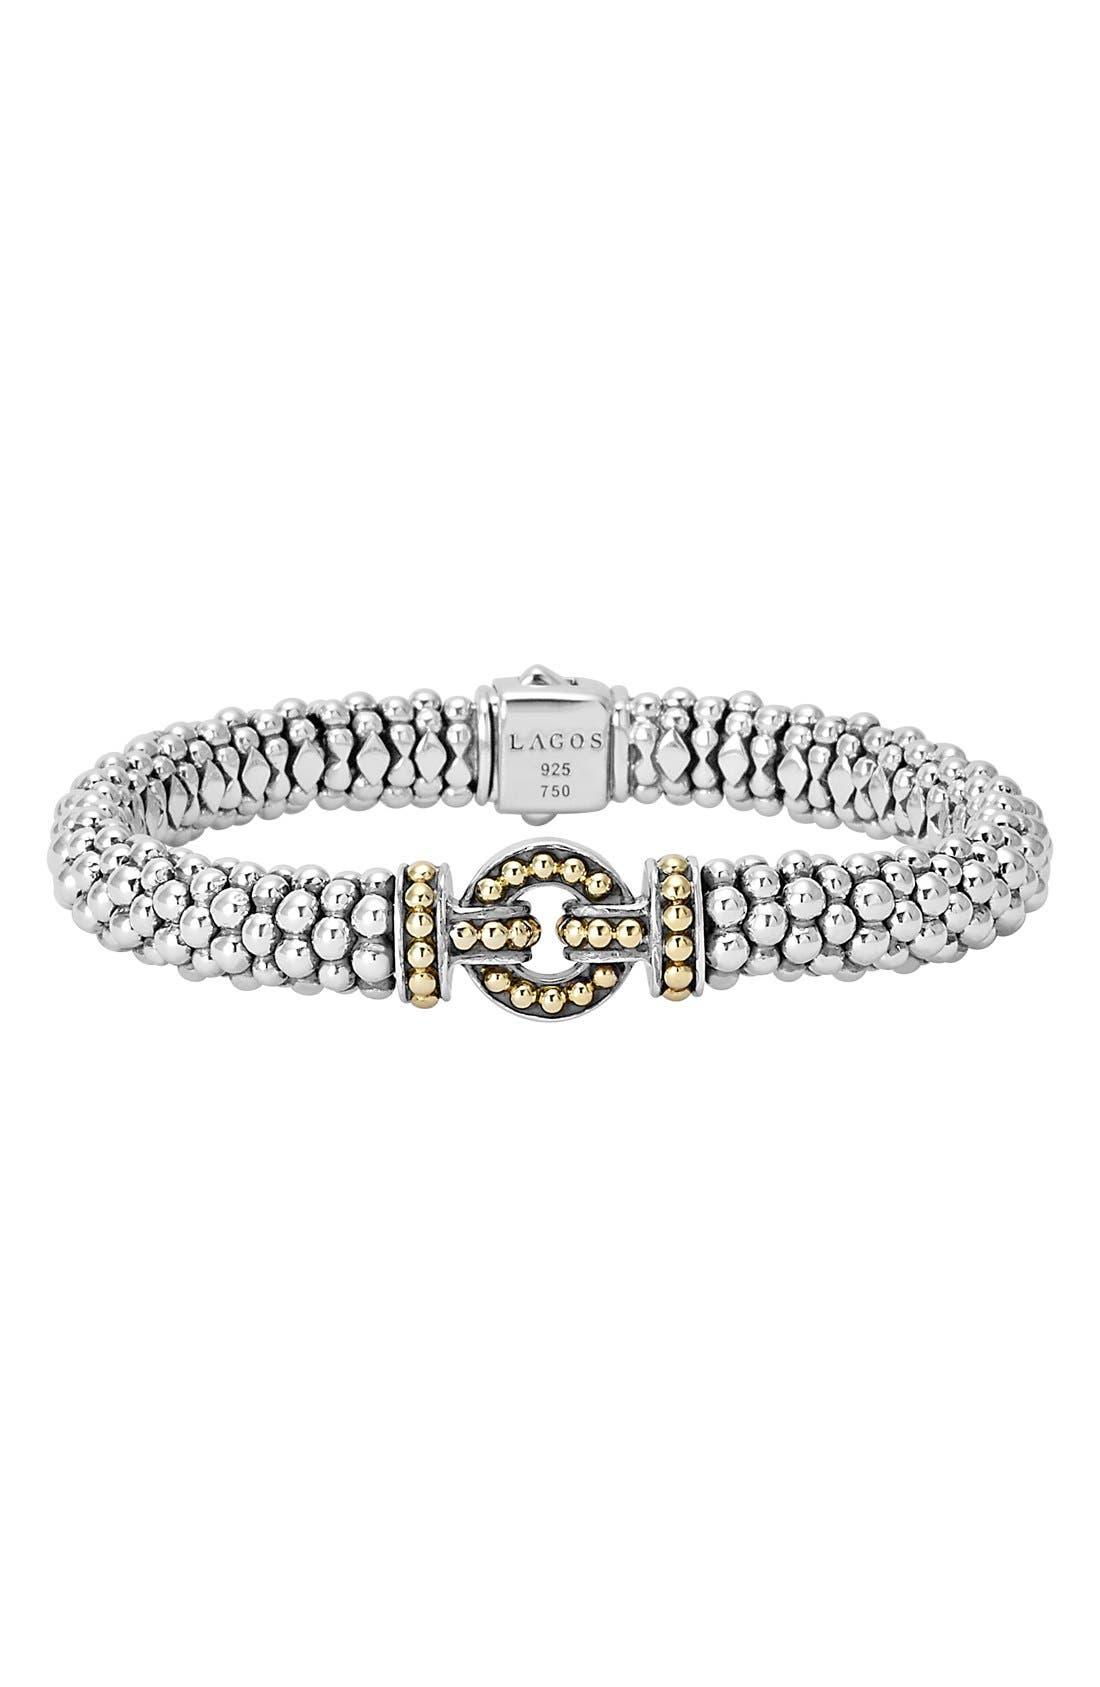 Main Image - LAGOS 'Enso' Two-Tone Rope Caviar Bracelet